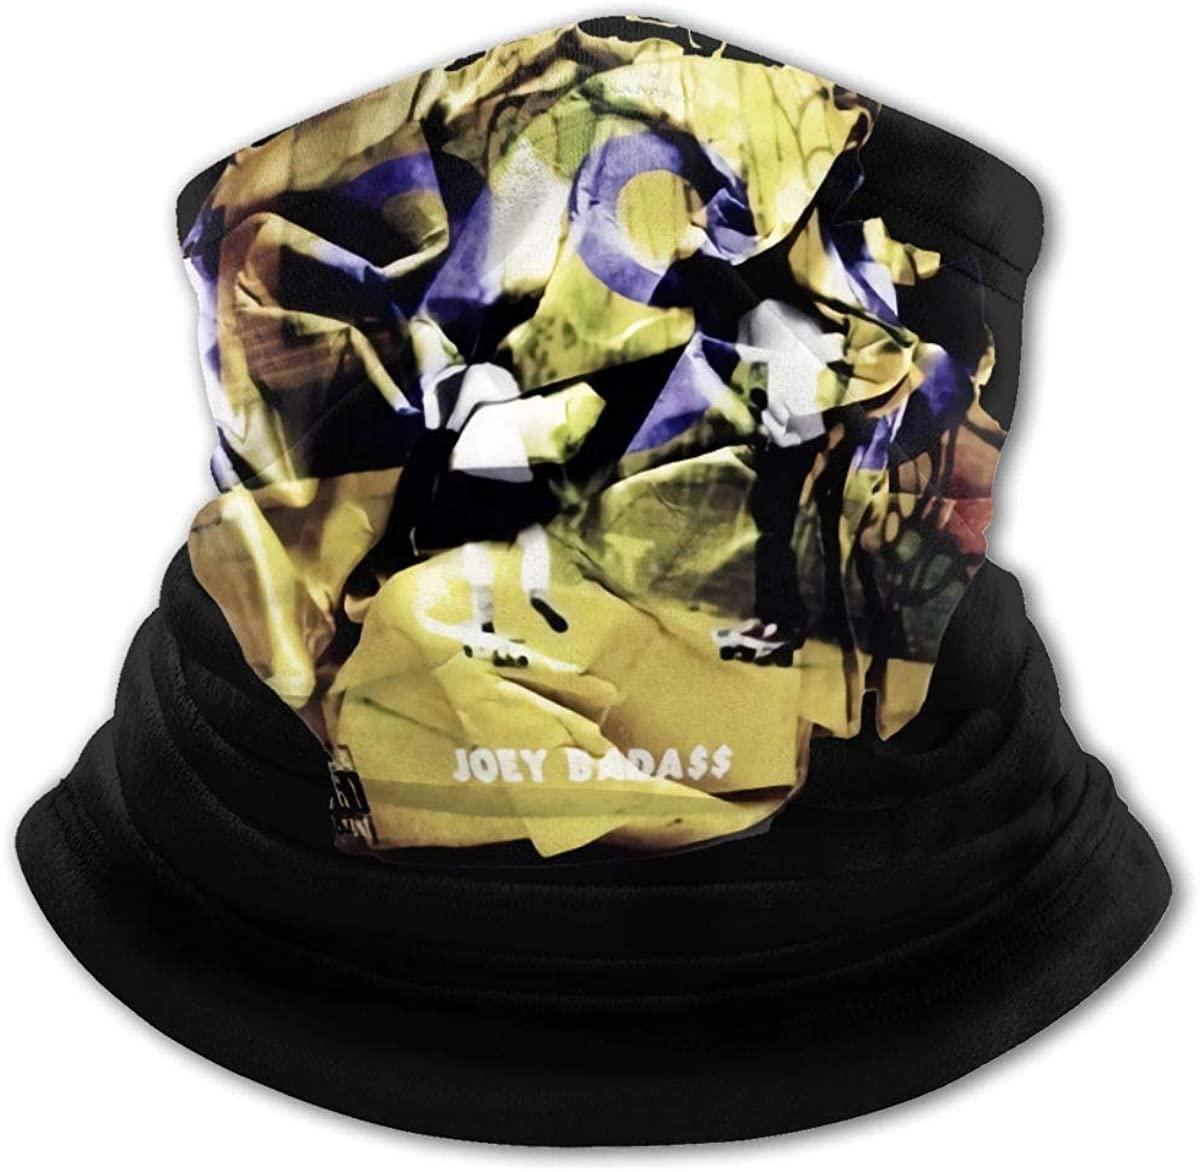 Joey Badass Face Mask Bandanas,Neck Gaiter,Headwear,Magic Scarf,Headband for Dust Sun Wind,Reusable Bandana Face Cover Black